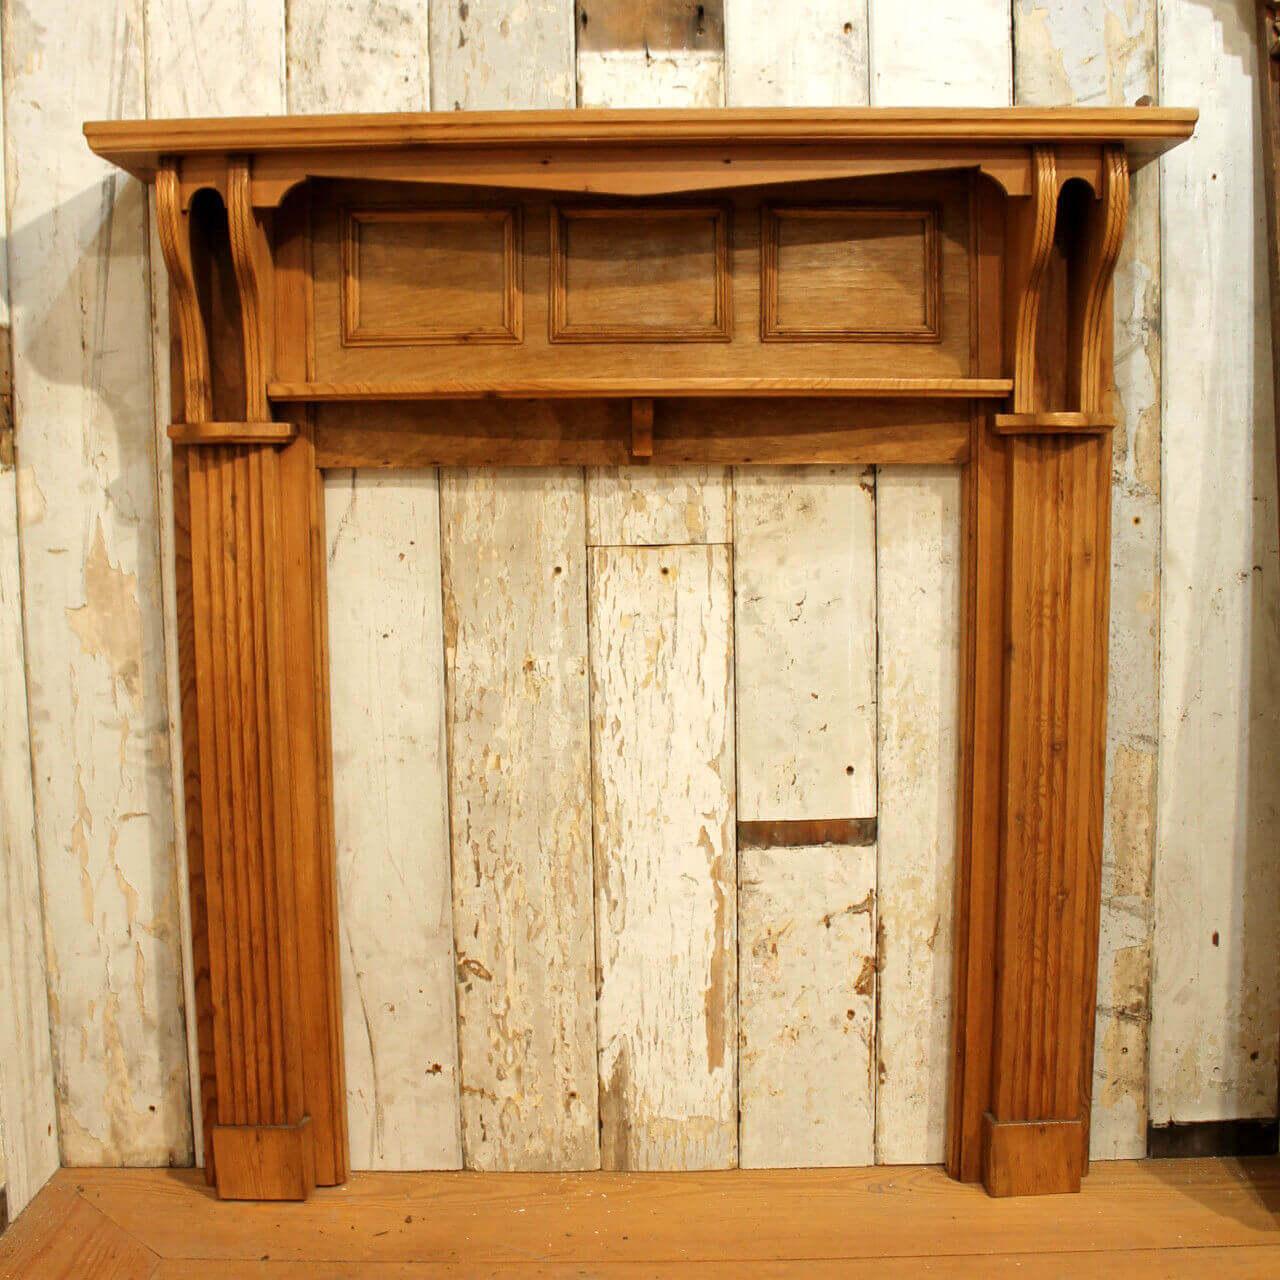 Bespoke Hand Crafted Pine Fireplace Surround Warwick Reclamation